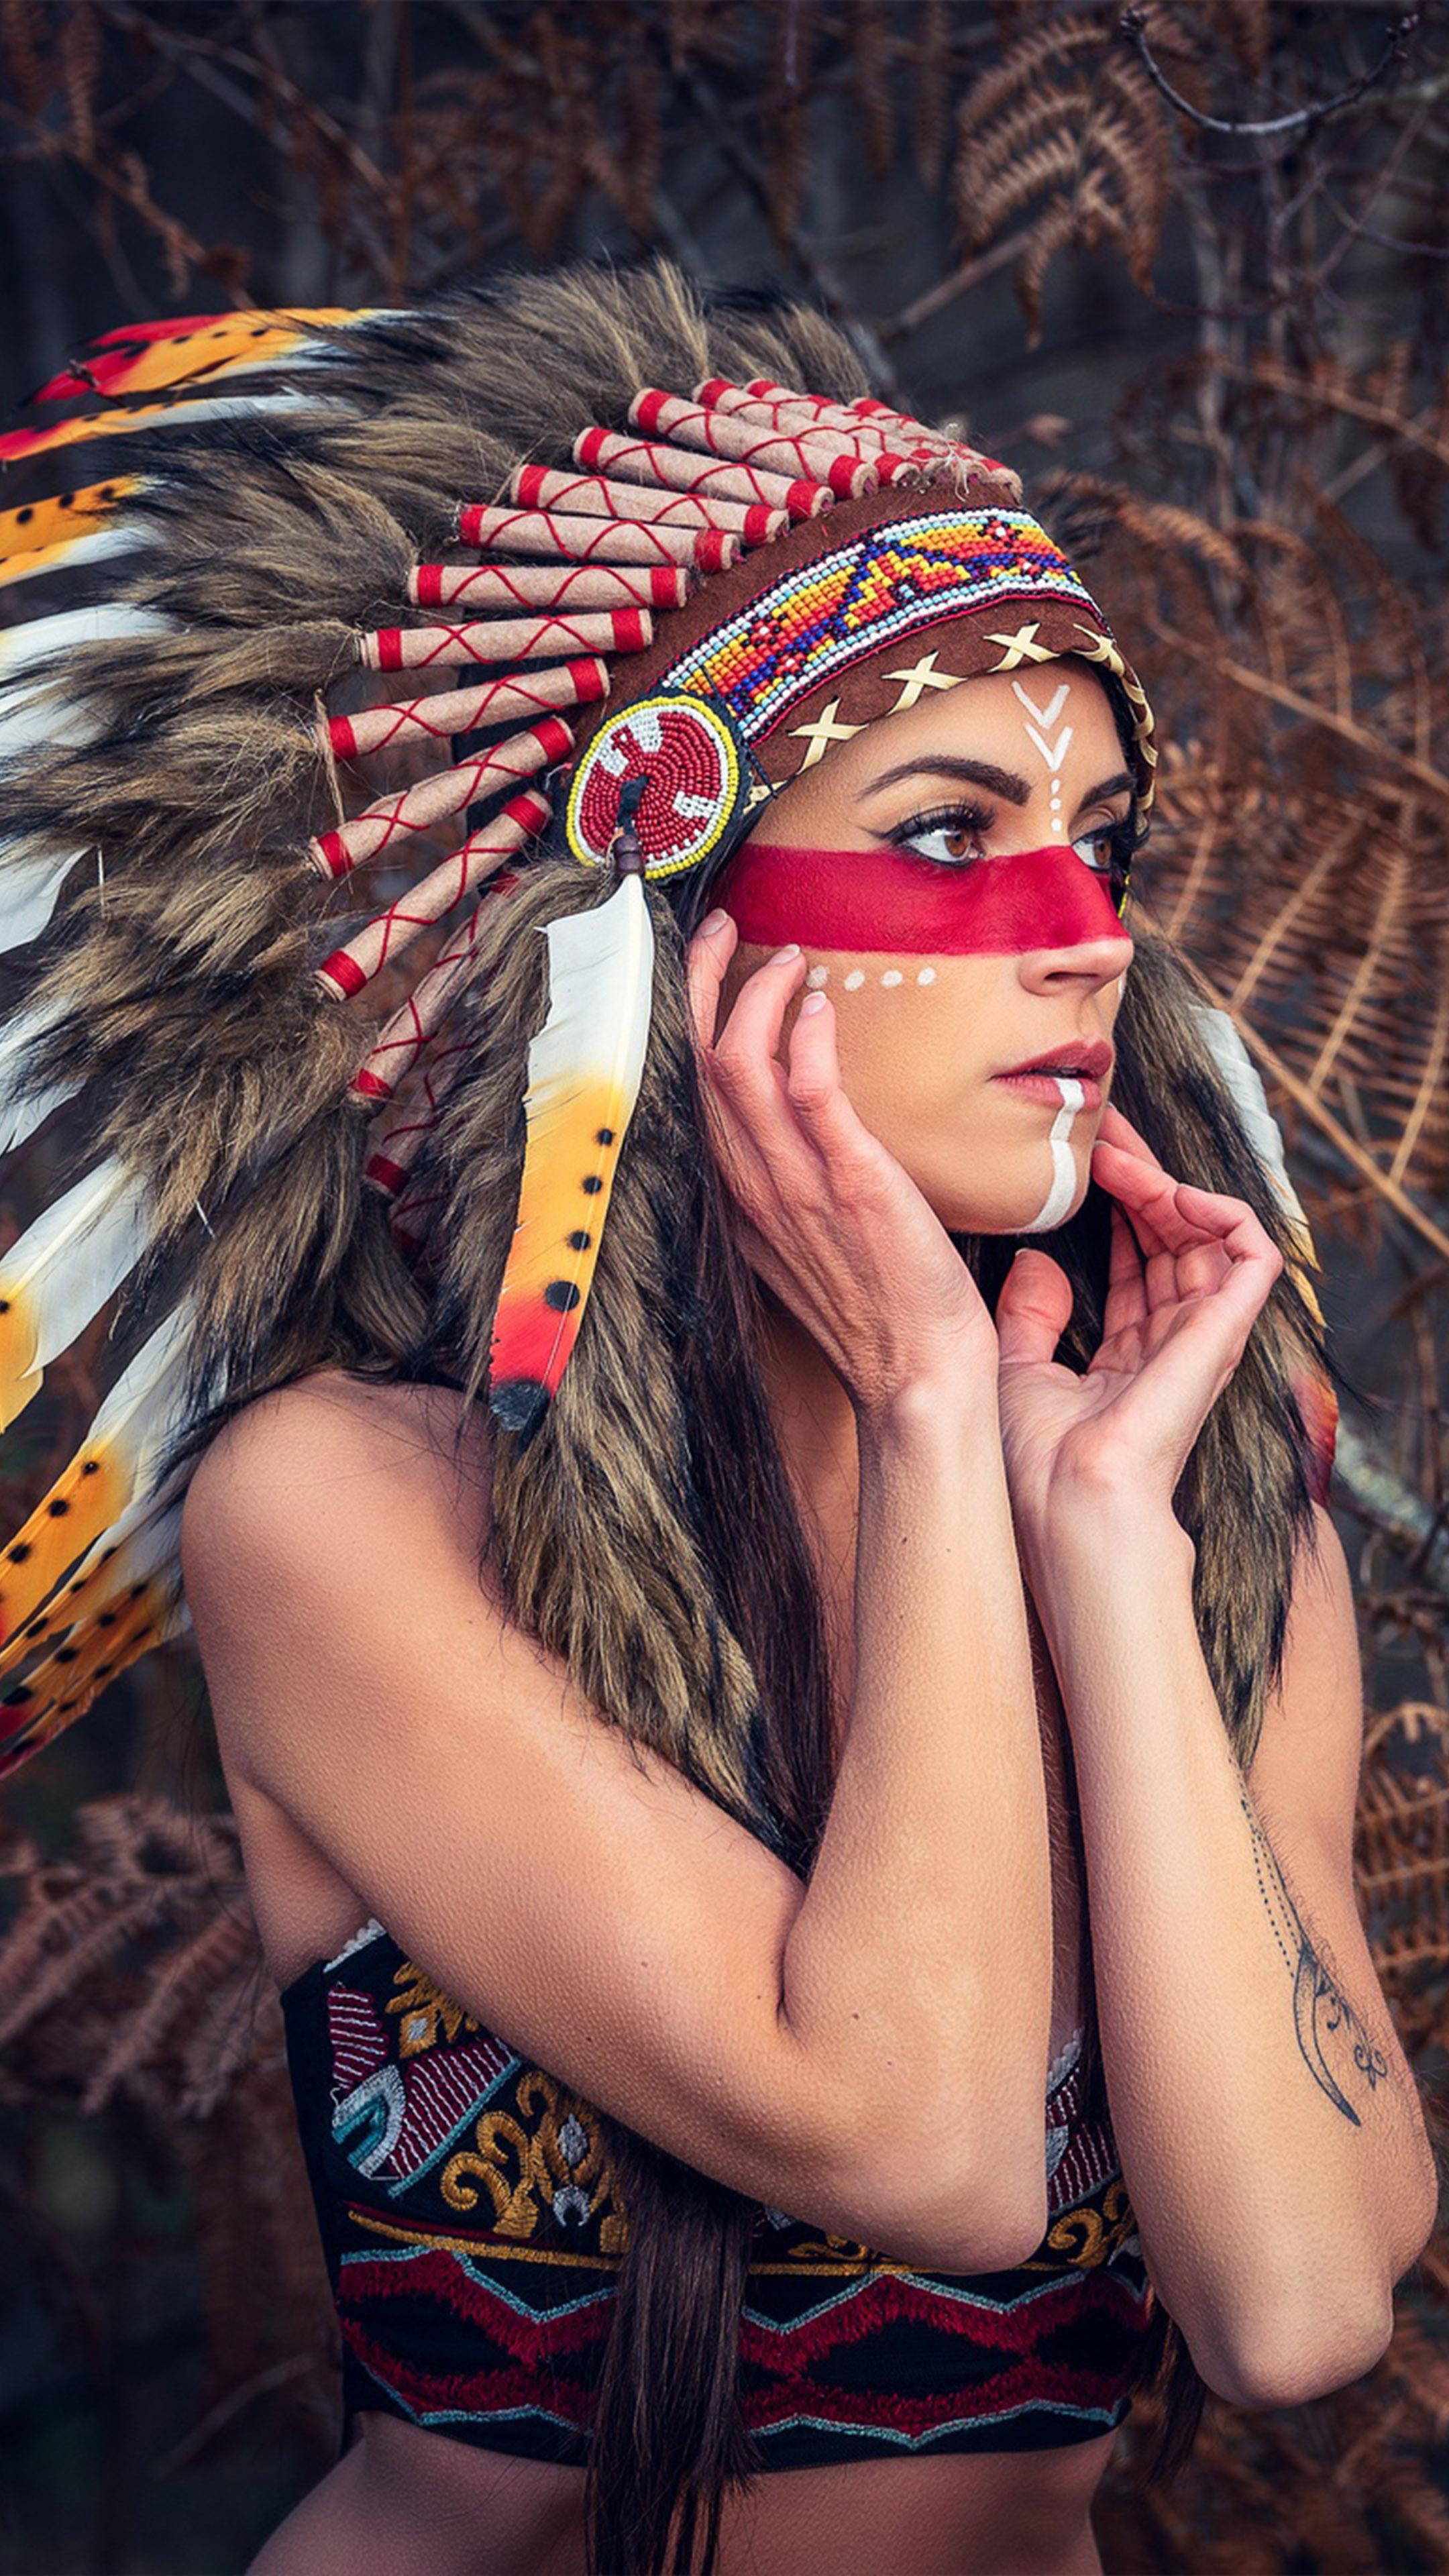 Girl Headdress Native American 4K Ultra ...